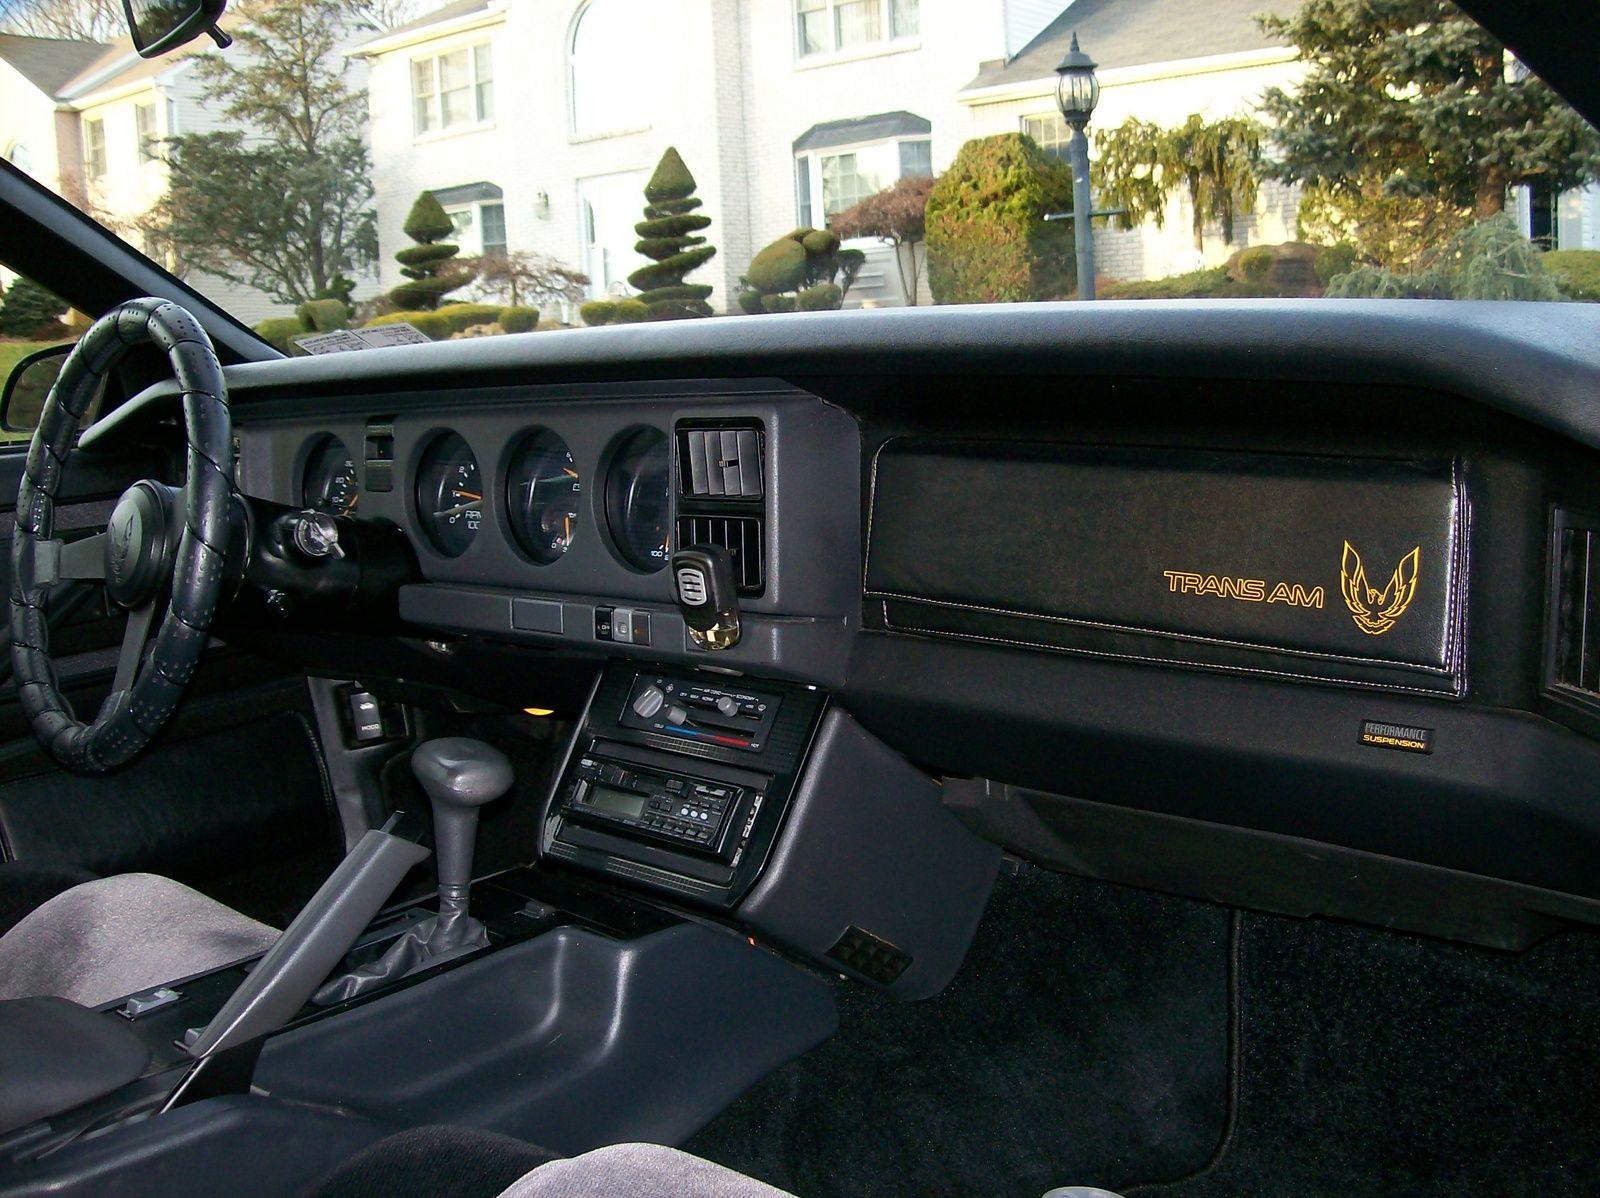 1985 Pontiac Trans Am Pictures Cargurus Trans Am Trans Am Pontiac Pontiac Firebird Trans Am